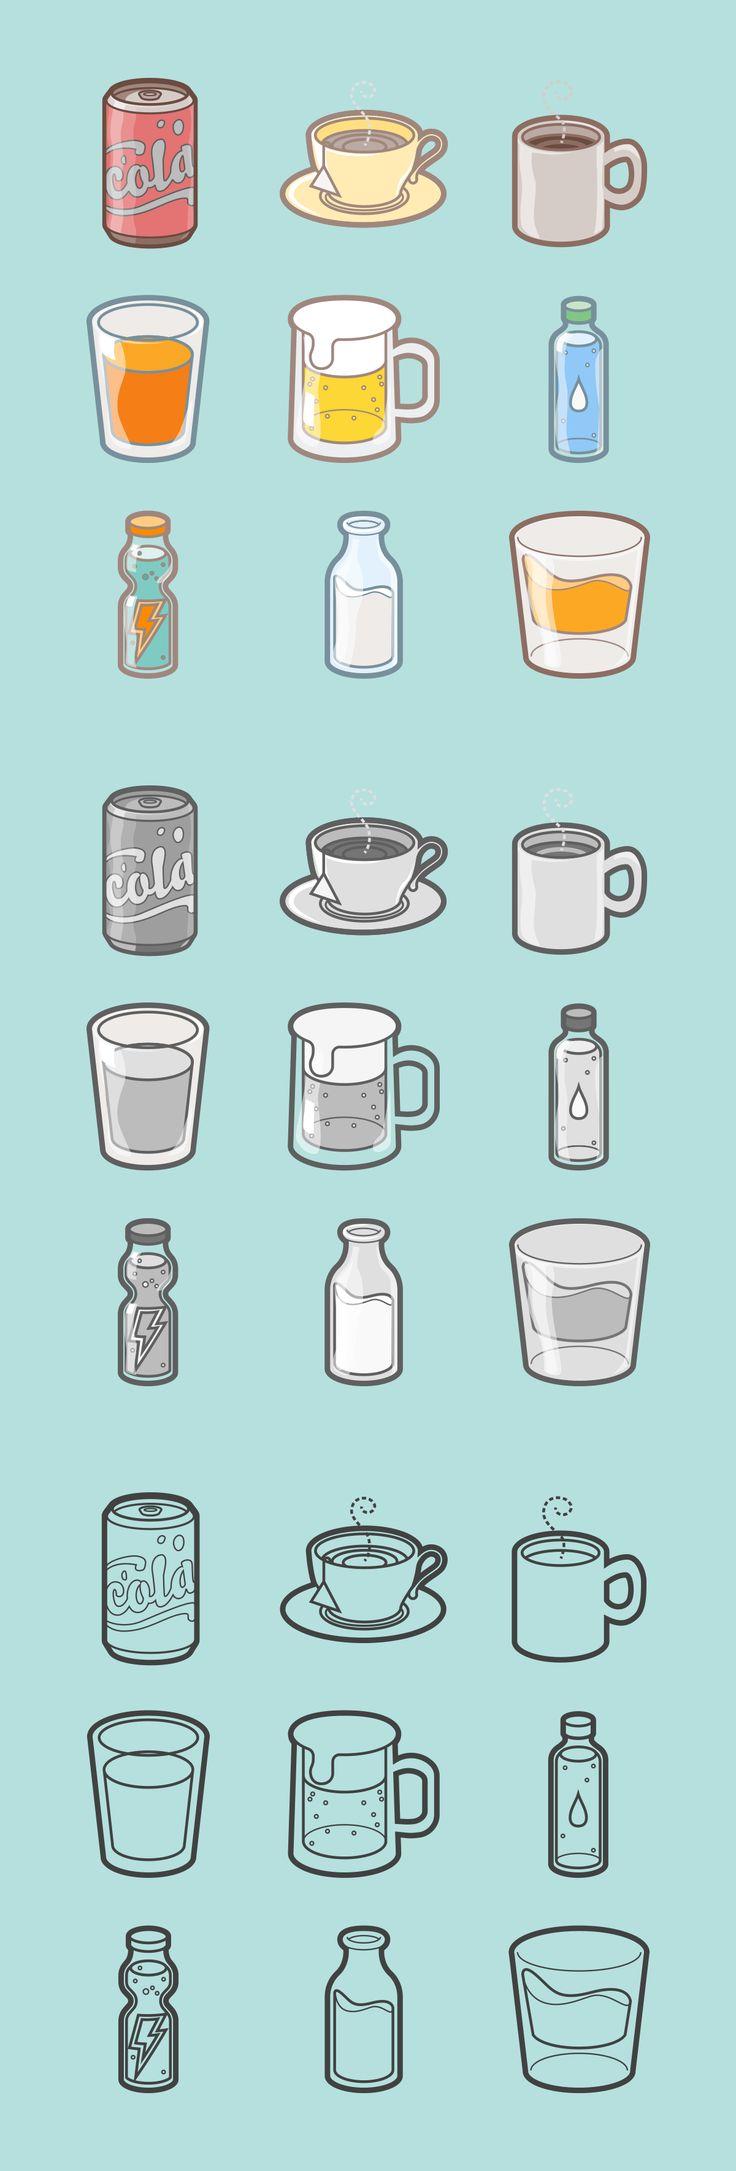 244 best кафе рестораны images on Pinterest | Infographic, Chart ...